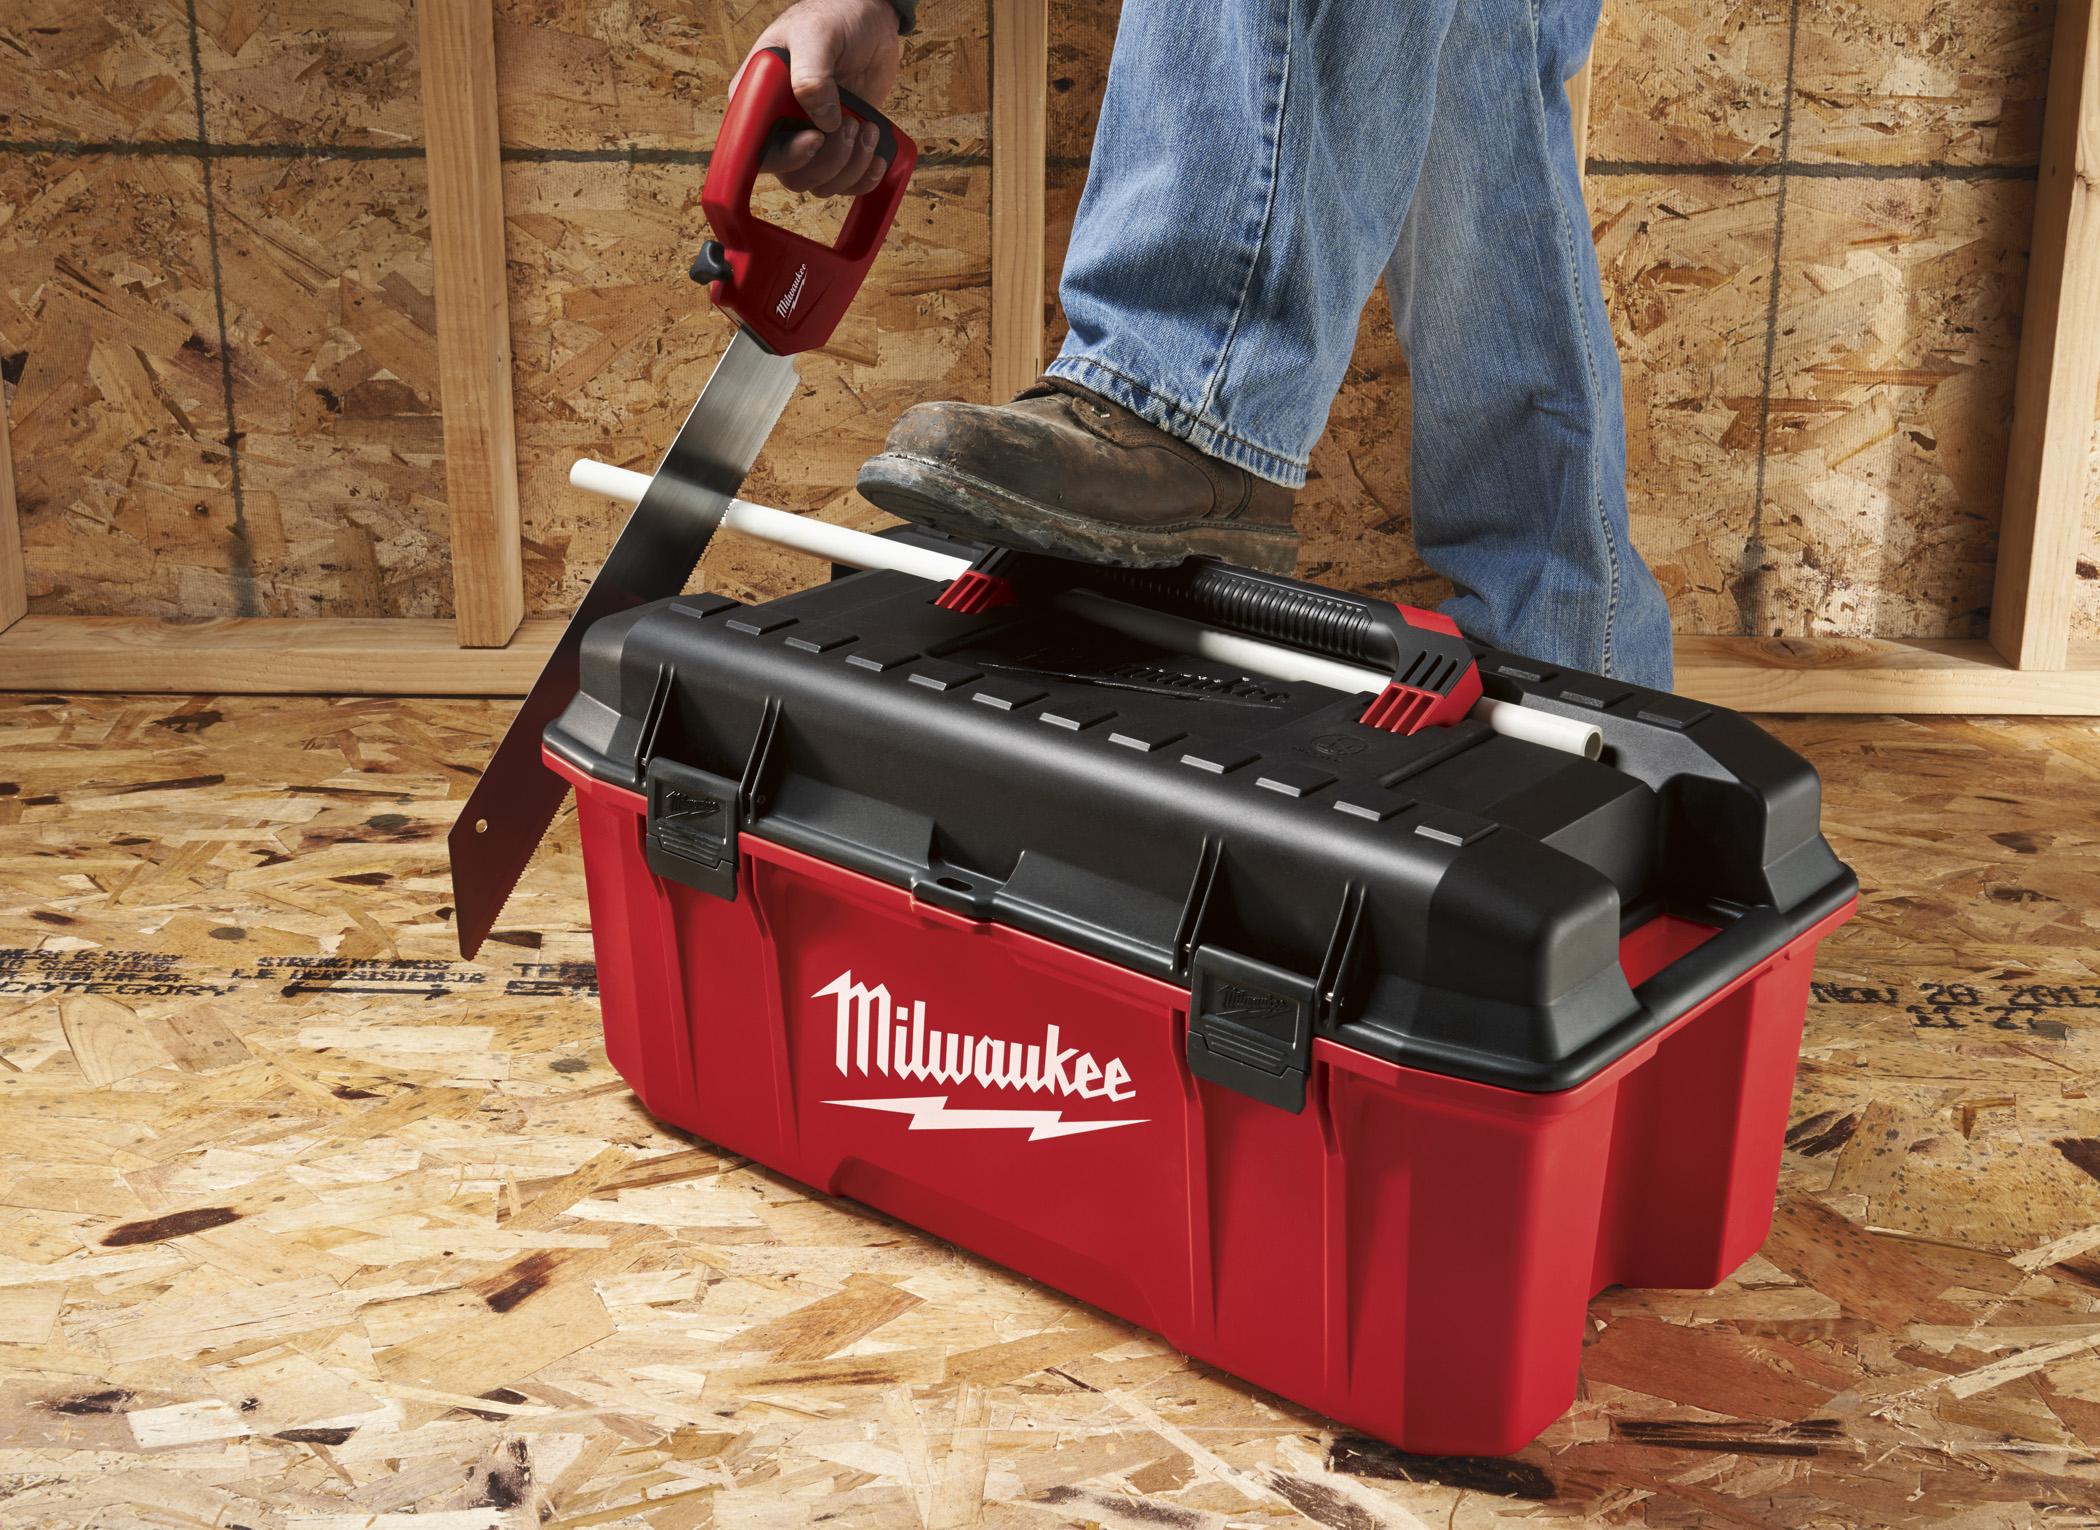 Milwaukee Introduces New Jobsite Work Box Tools Of The